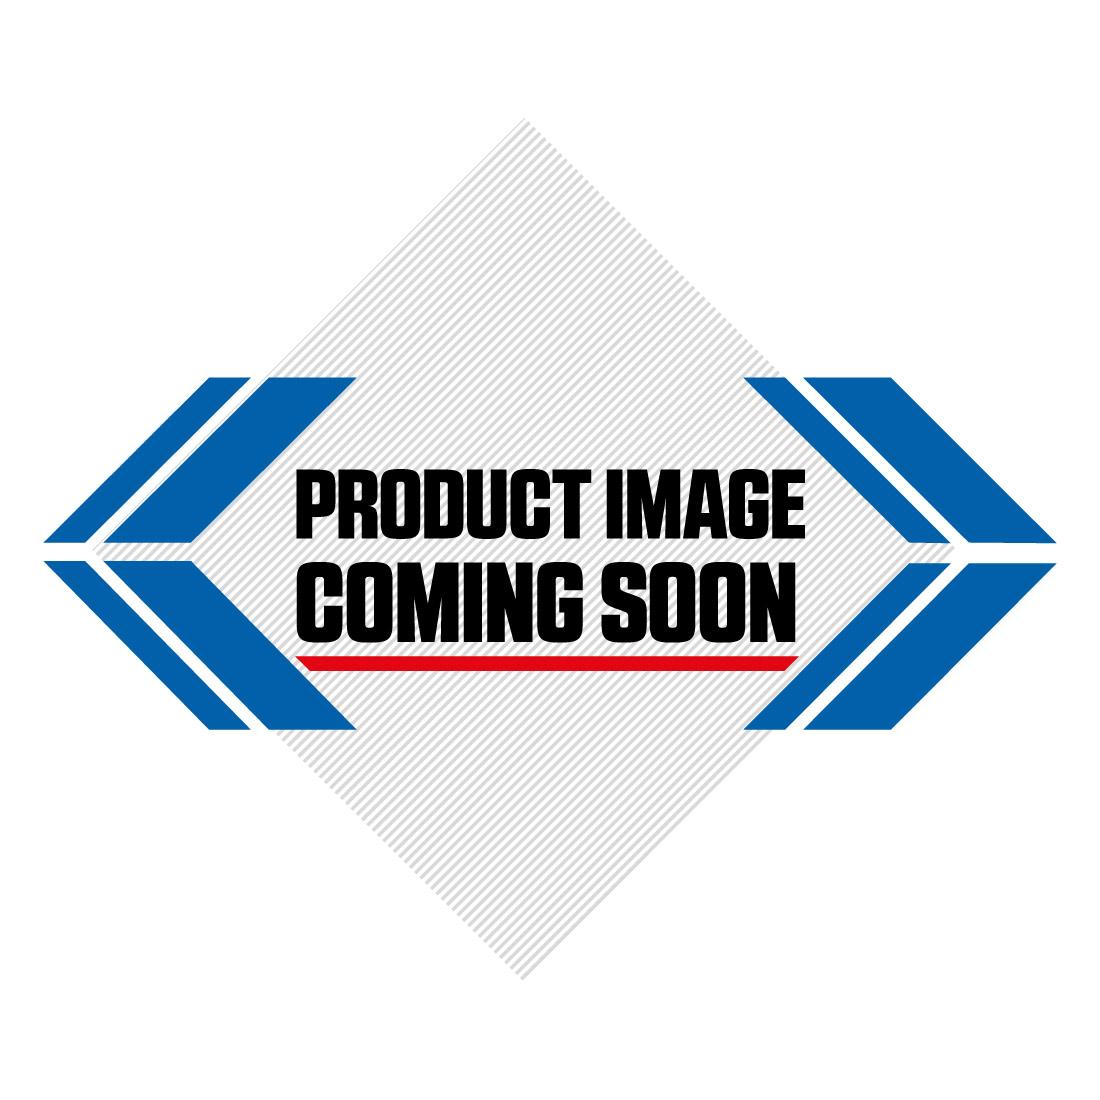 Suzuki Plastic Kit  RM 125 250 (99-00) Black Image-4>